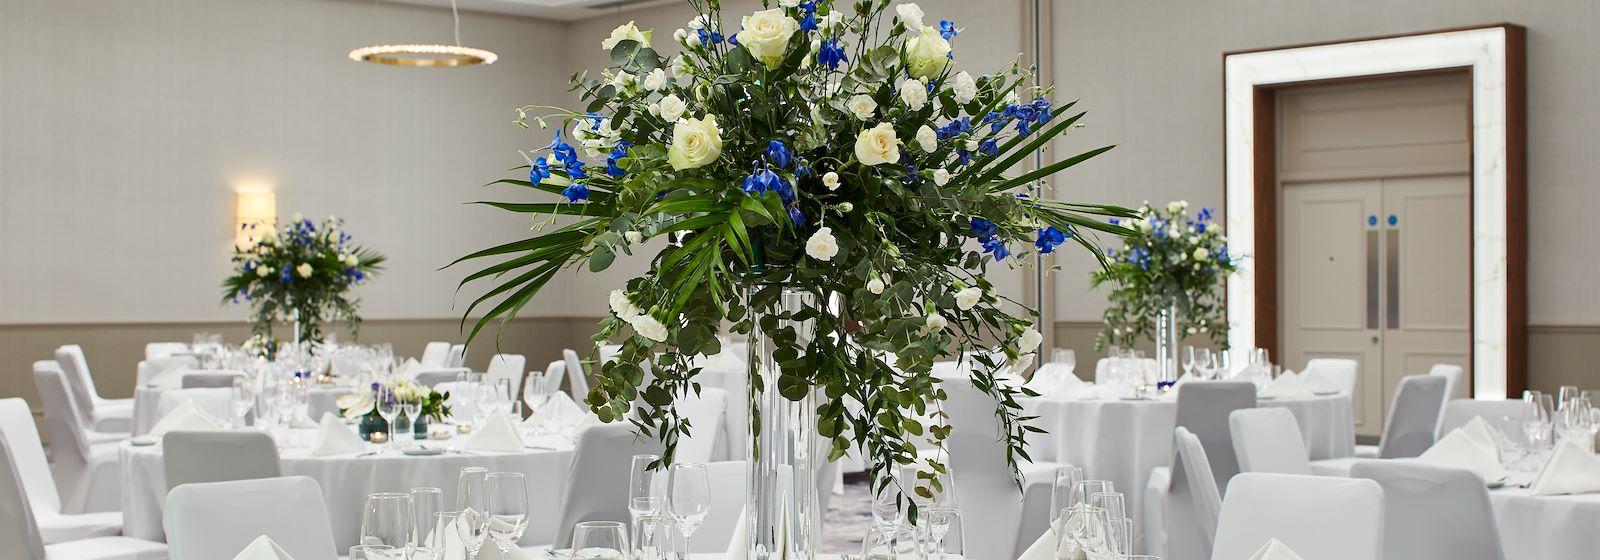 london marriott hotel west india quay wedding party venues